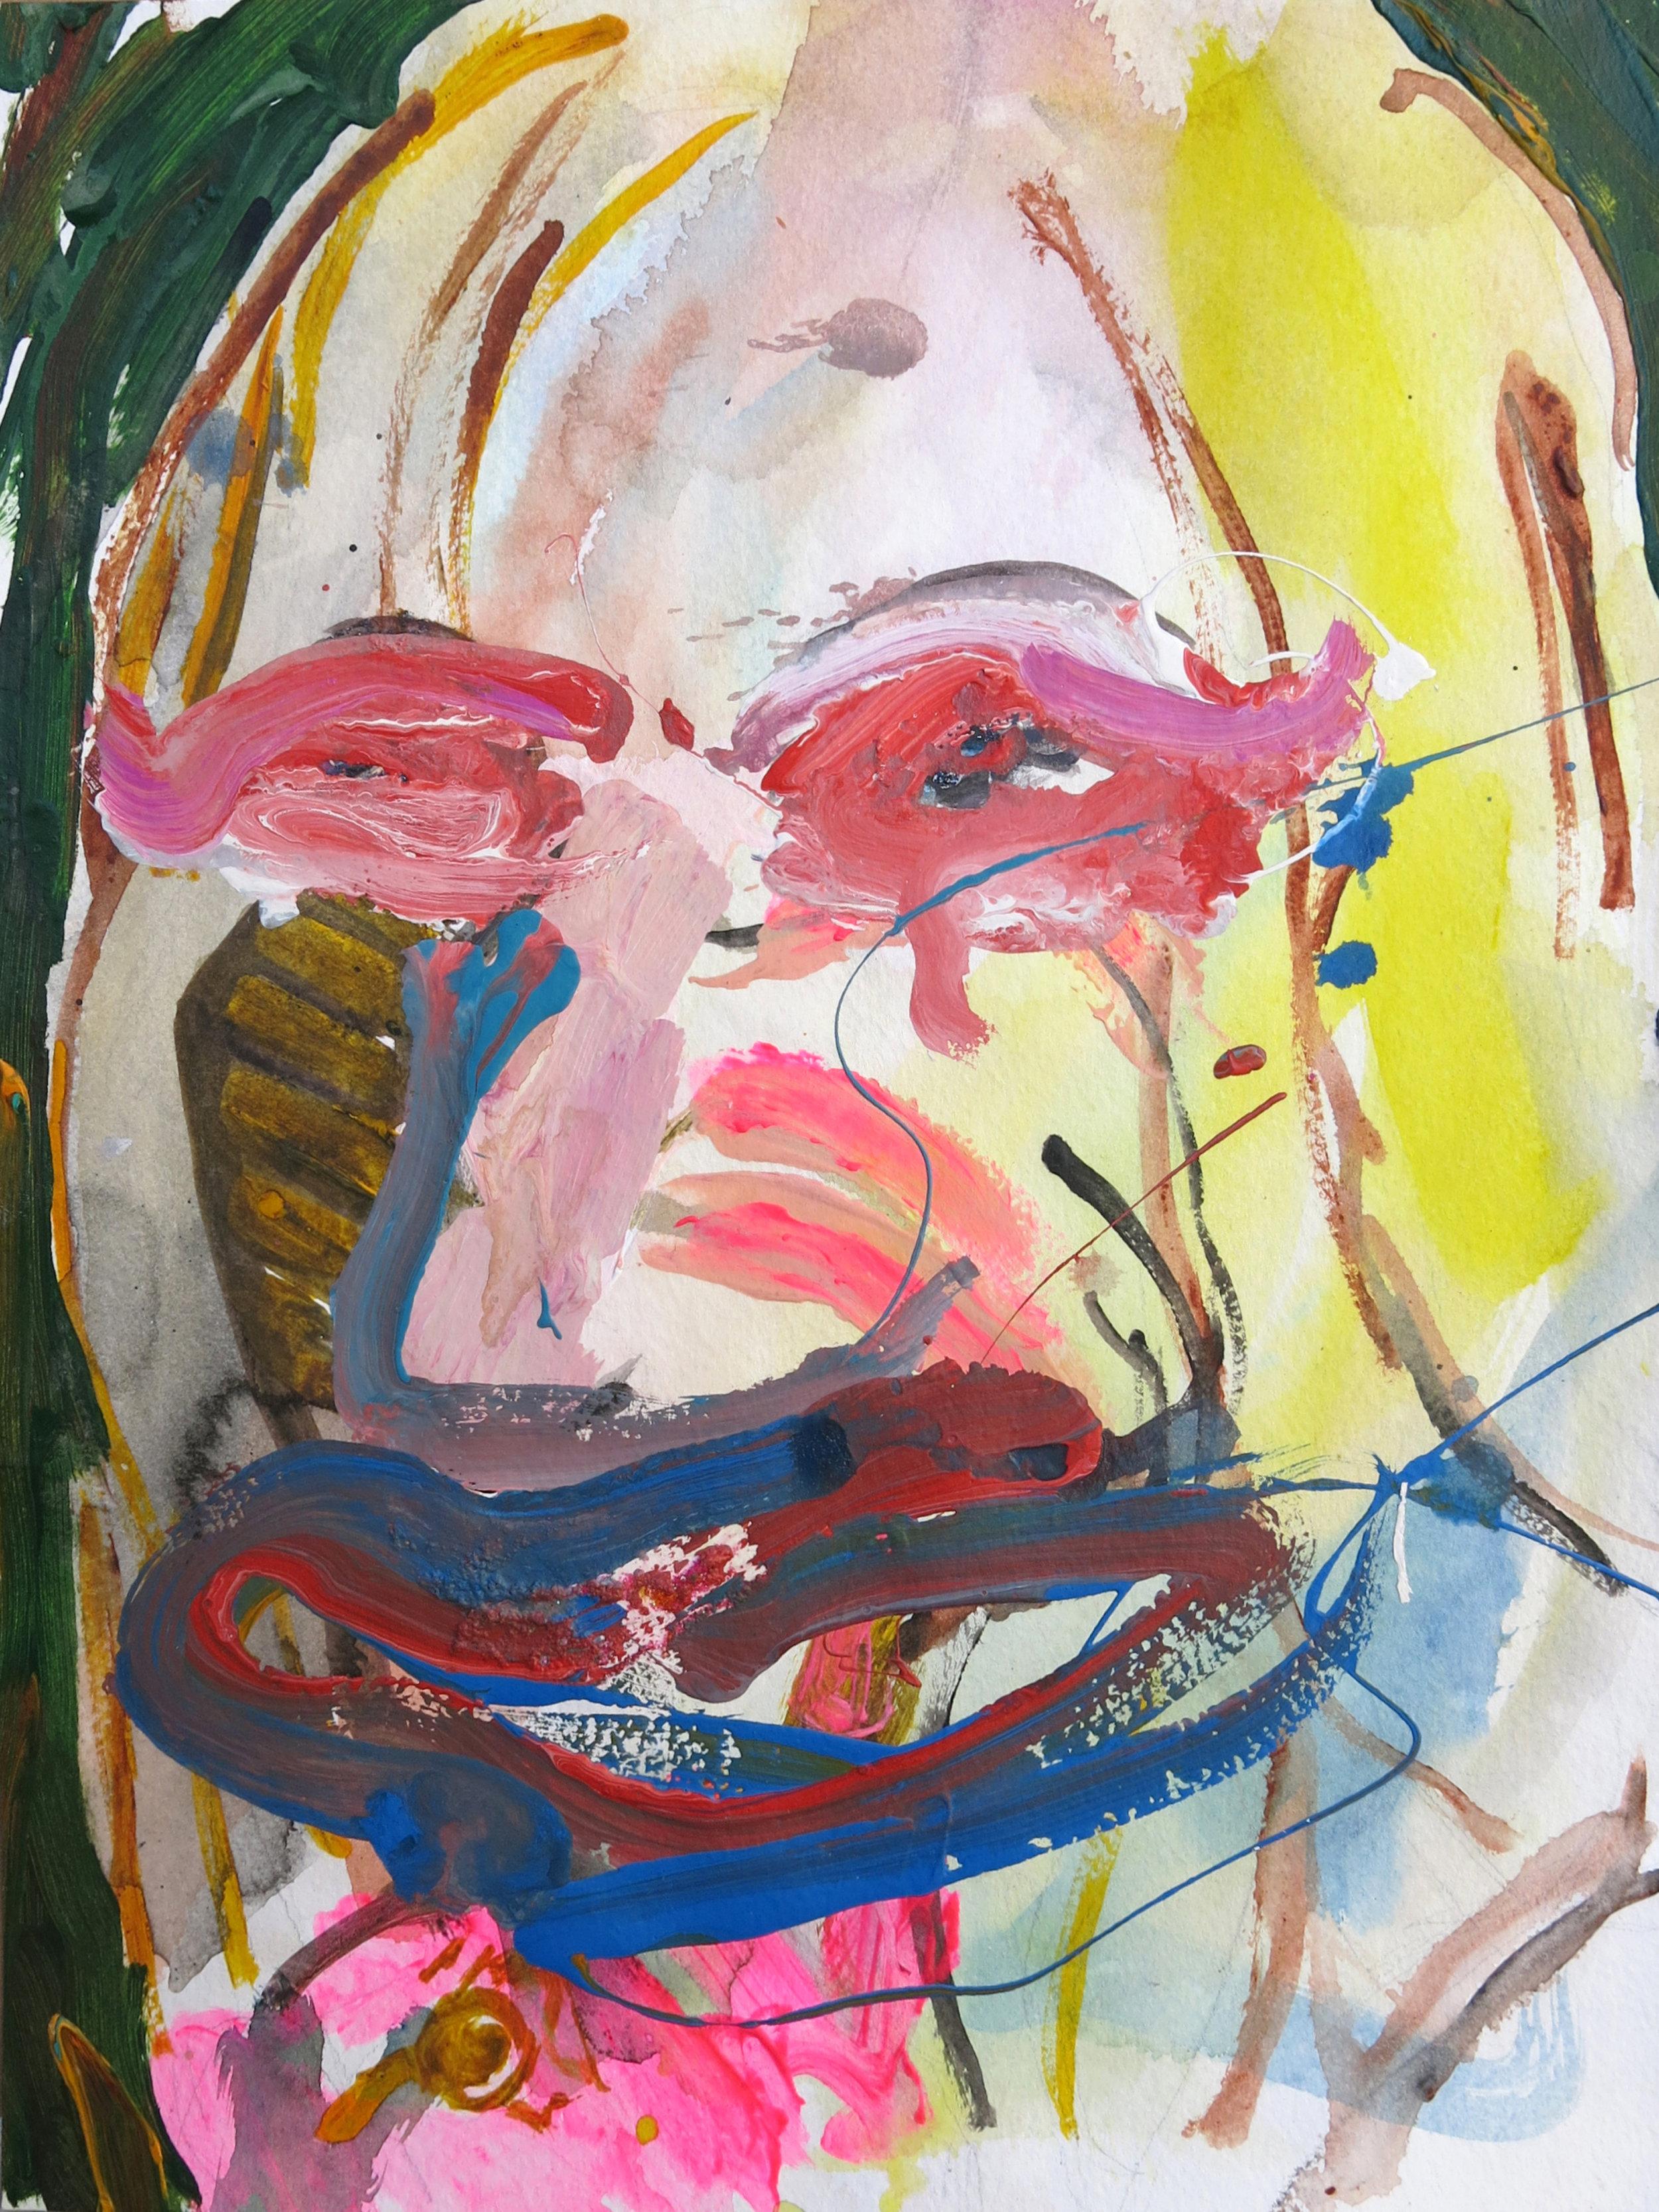 Barbra Streisand Portrait #164